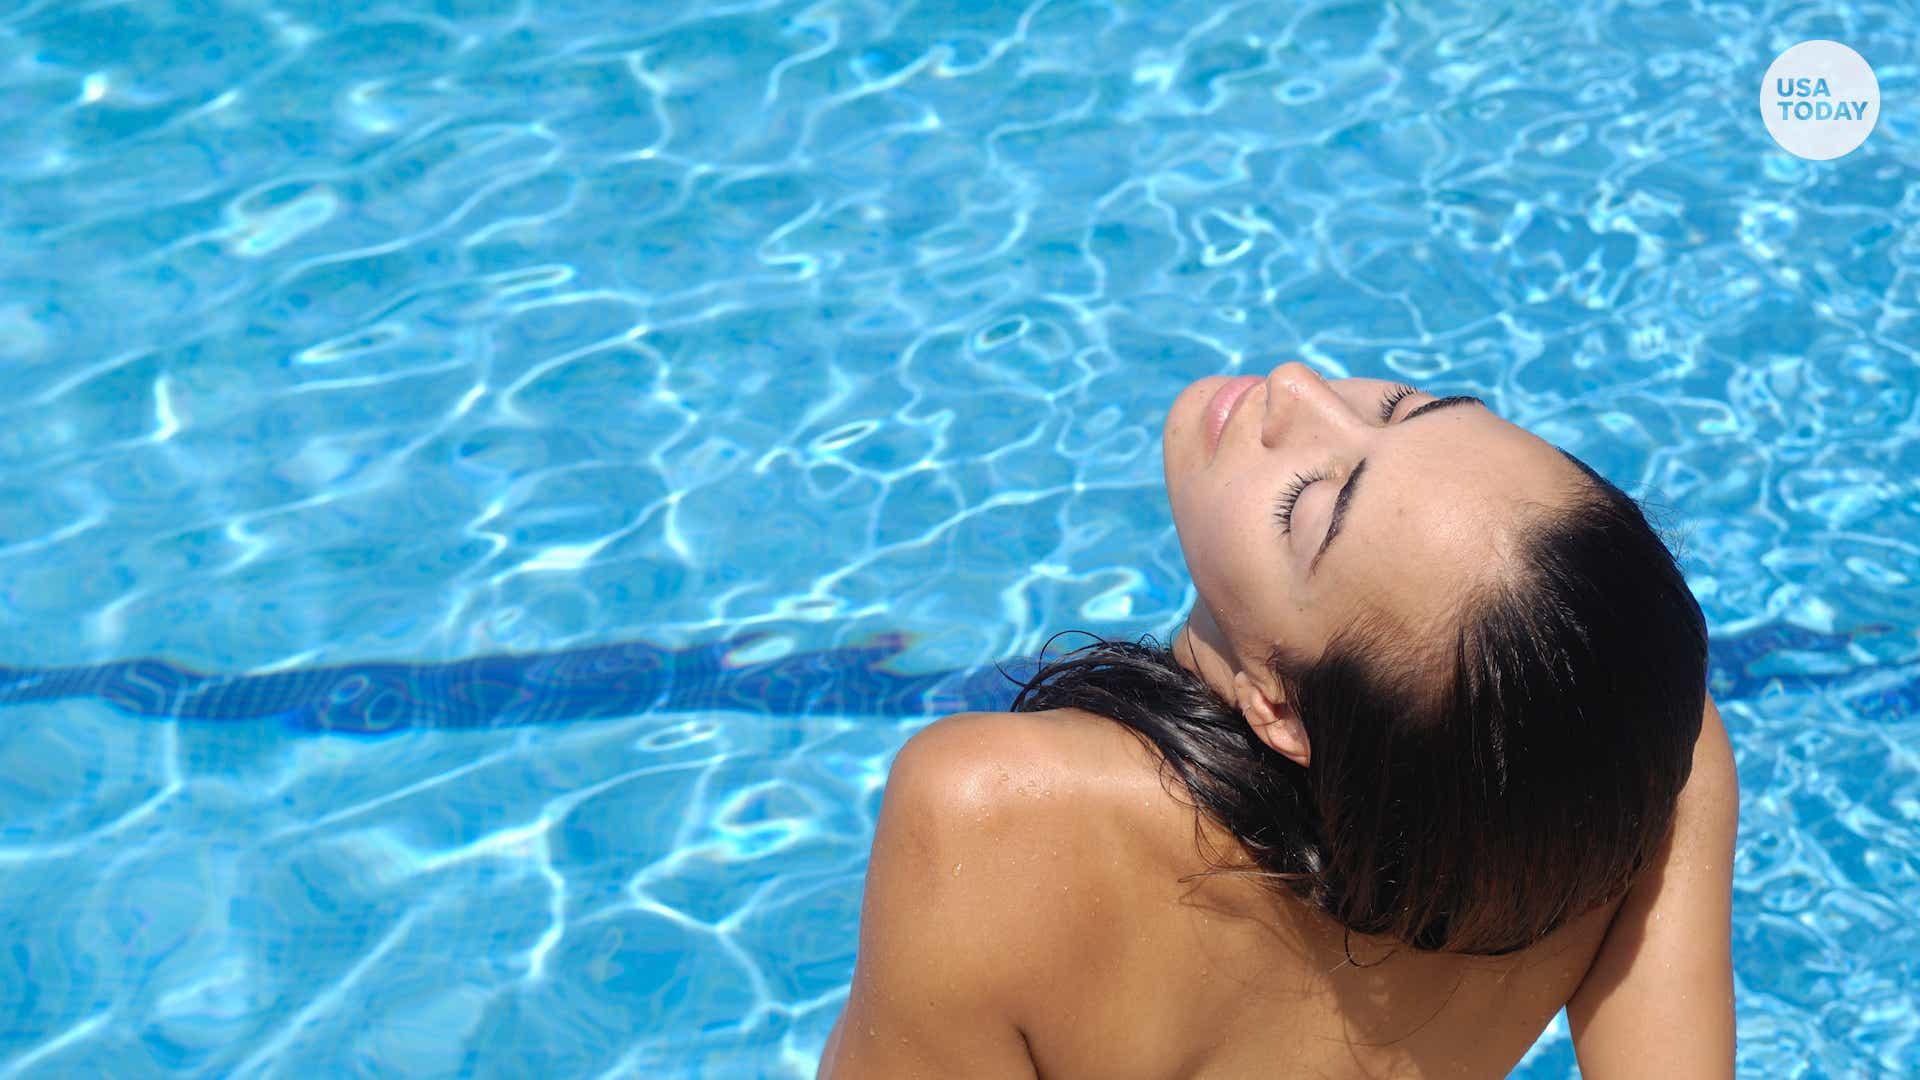 Hots Nude Beach Naples Fl Gif